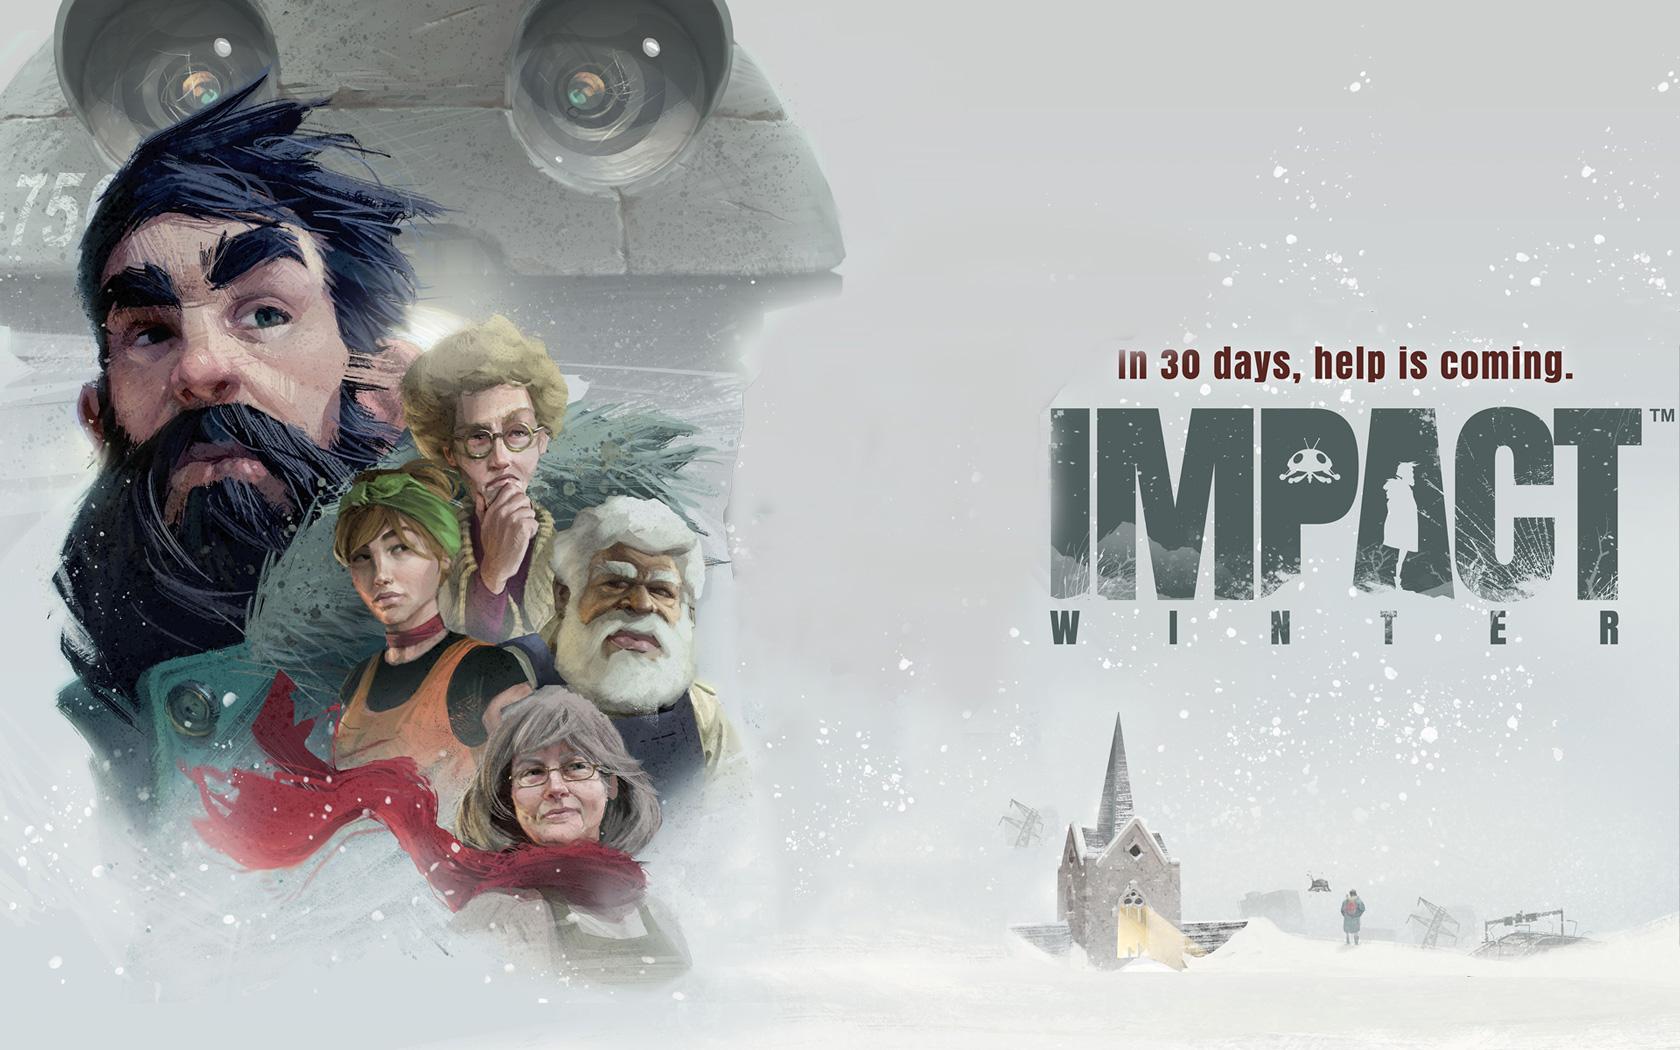 Free Impact Winter Wallpaper in 1680x1050